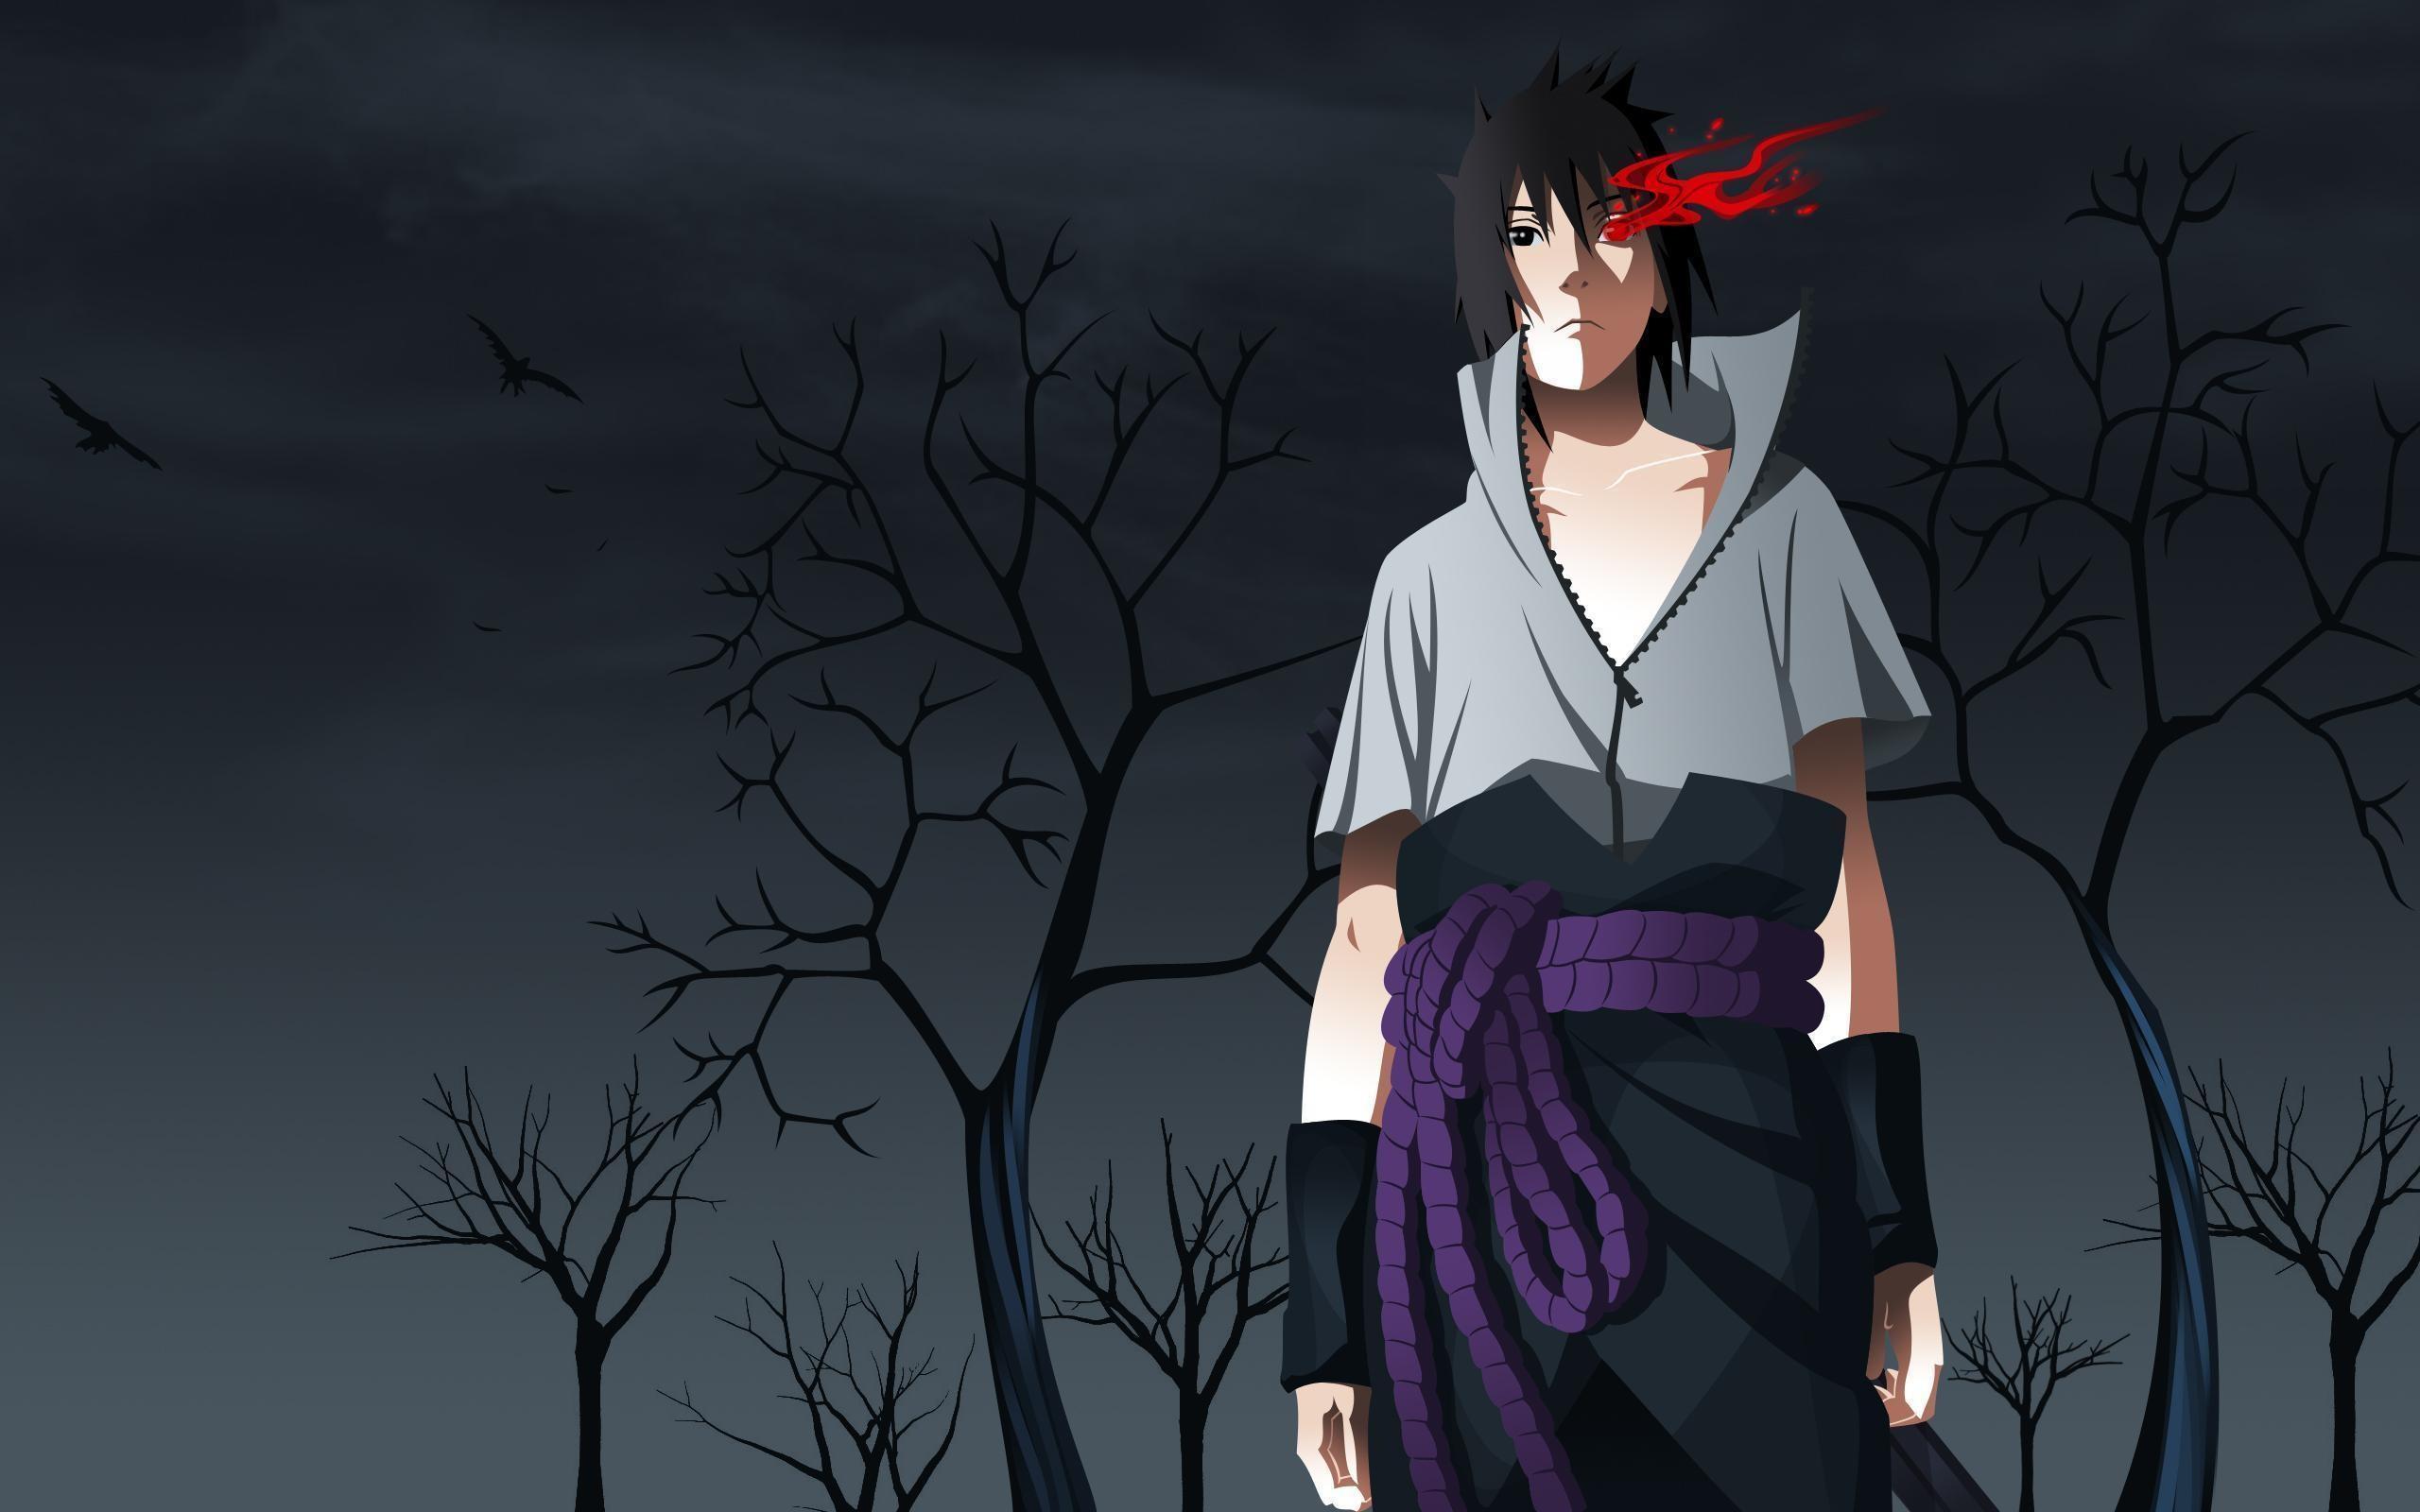 Sasuke Uchiha 14 HD Images Wallpapers | HD Image Wallpaper